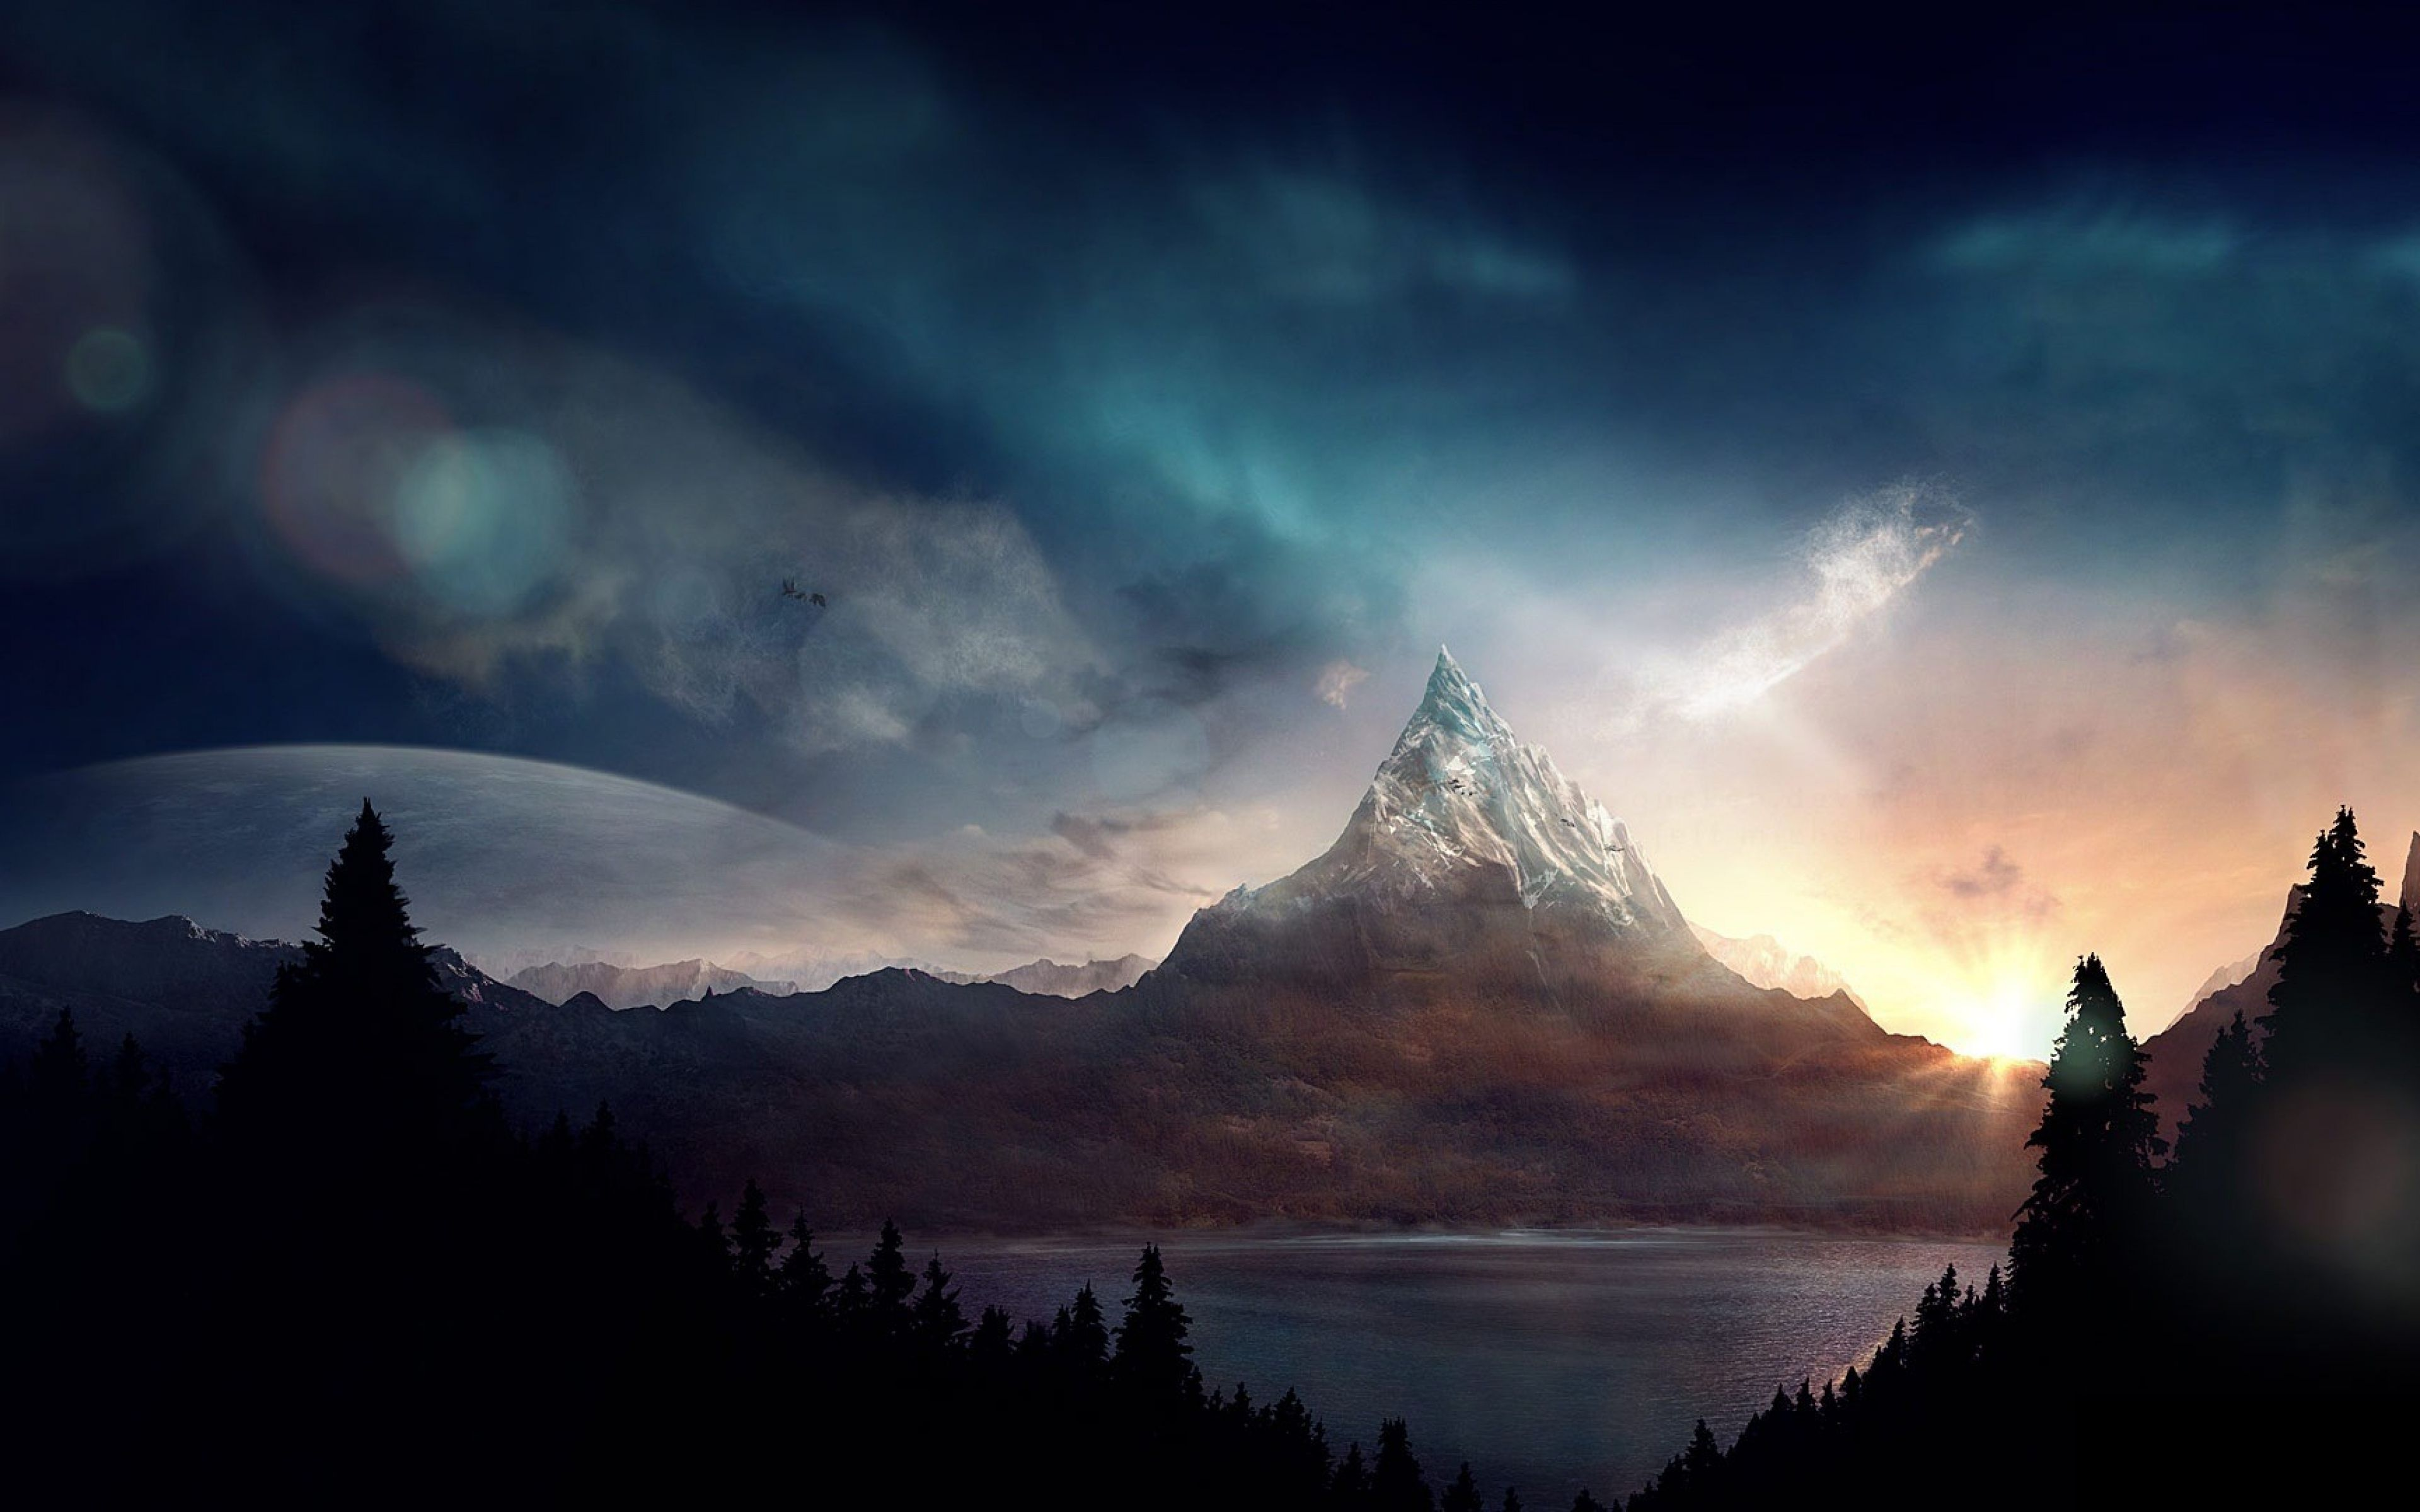 Dual Monitor Wallpaper Fantasy Pesquisa Google Landscape